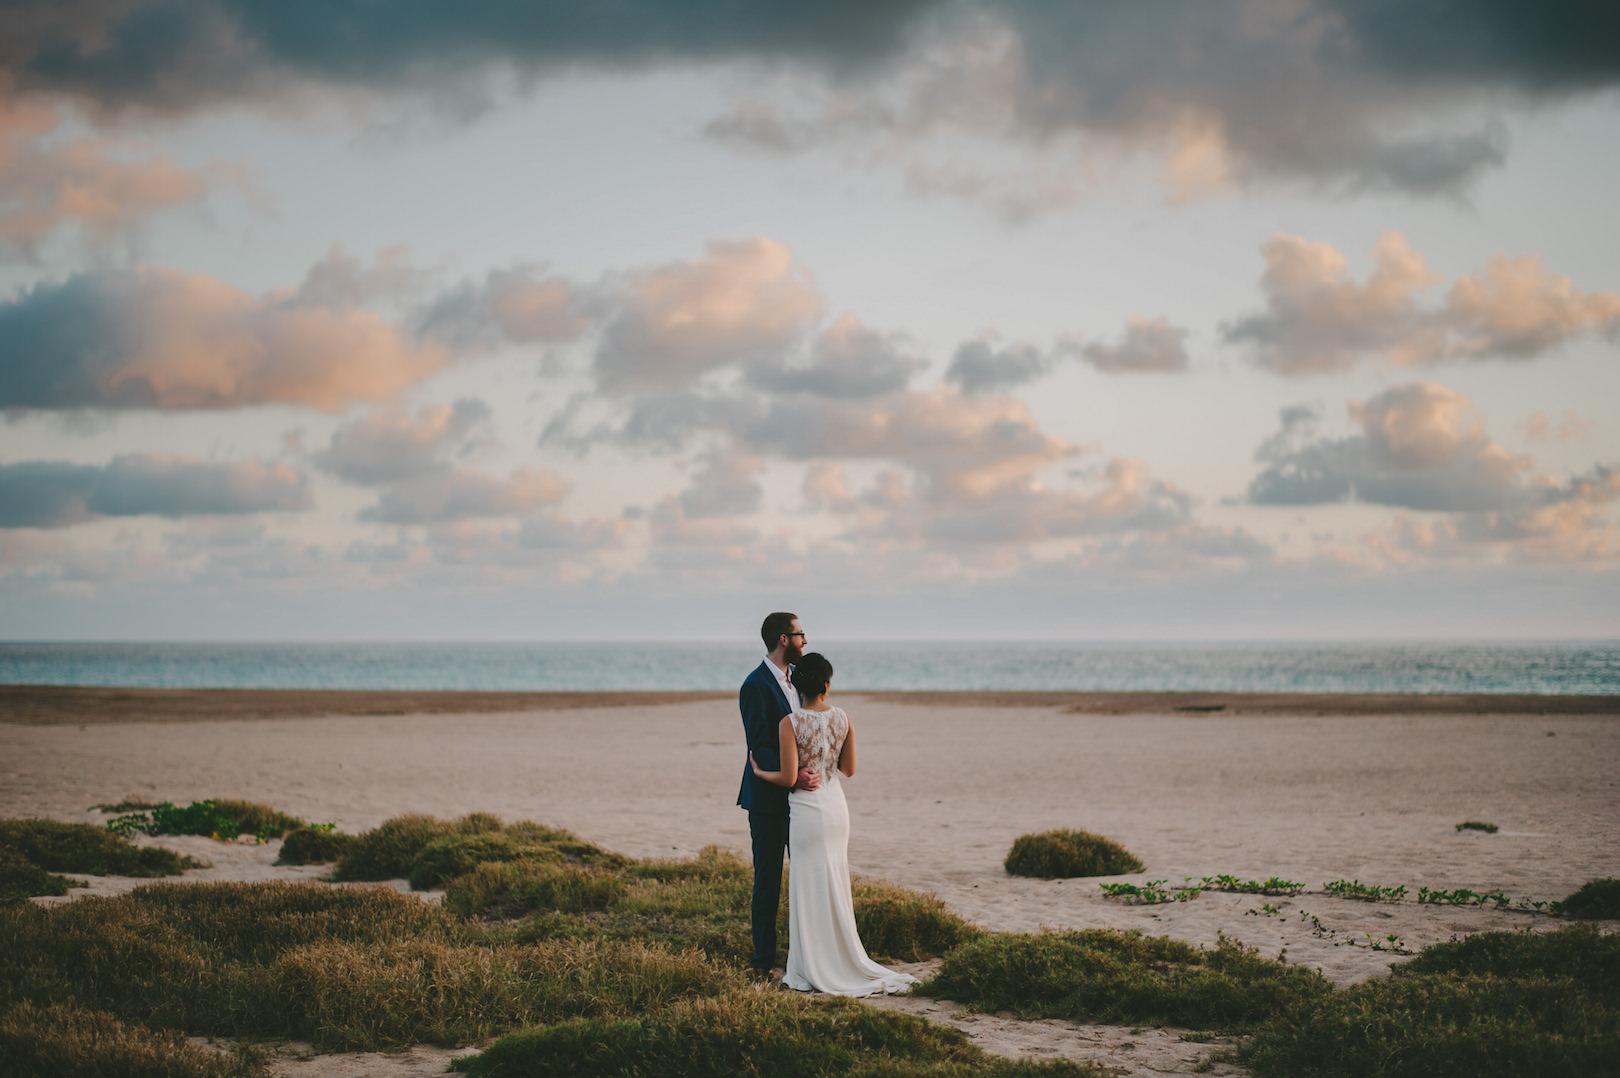 Nathan & Felicia - Wedding Day - © Dallas Kolotylo Photography - 581